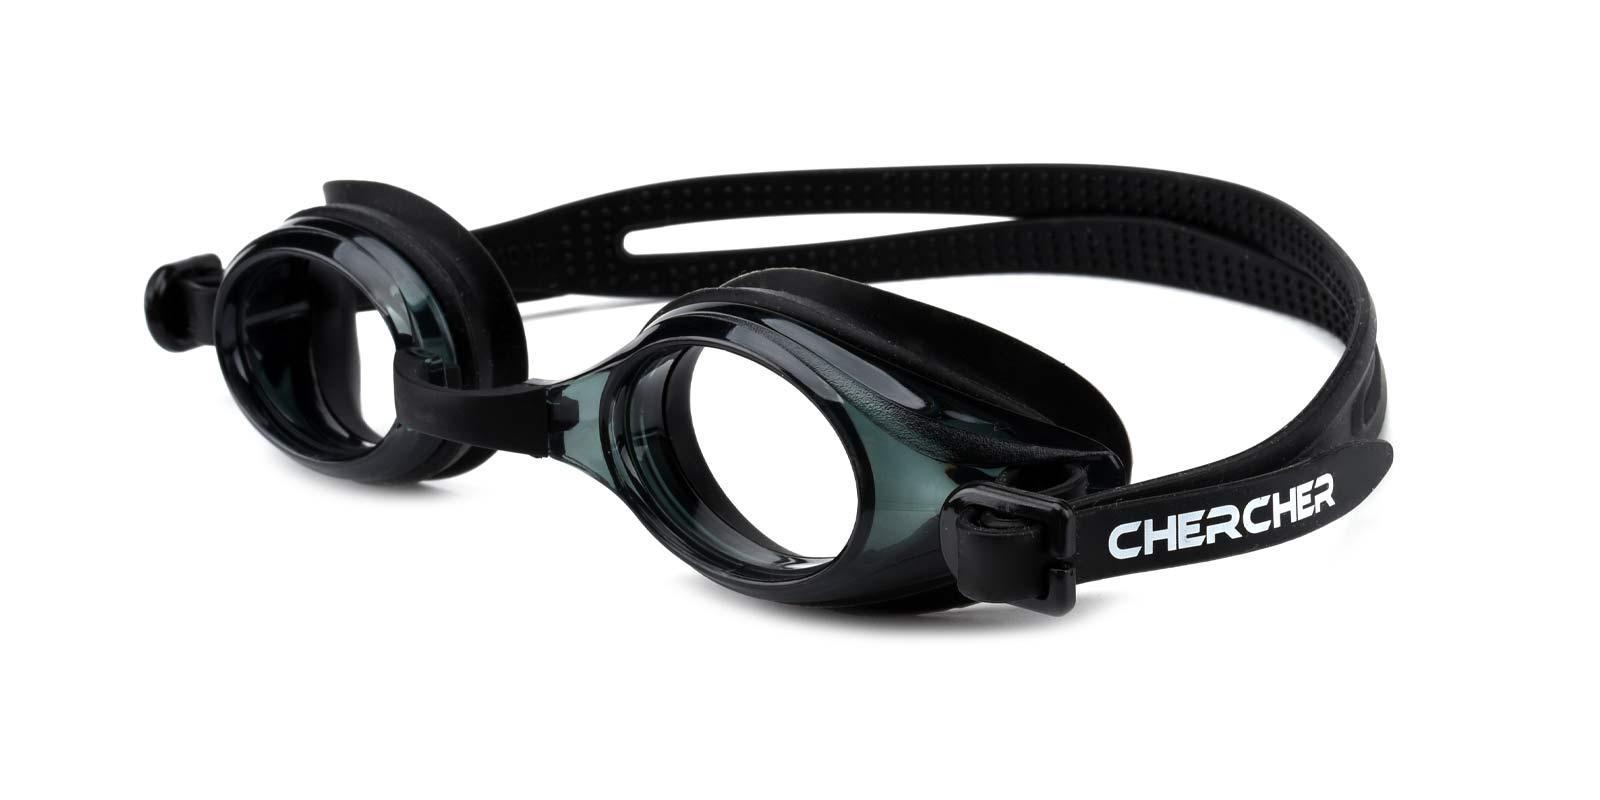 Swimming Goggles-Black-Geometric-Combination-SportsGlasses-additional1